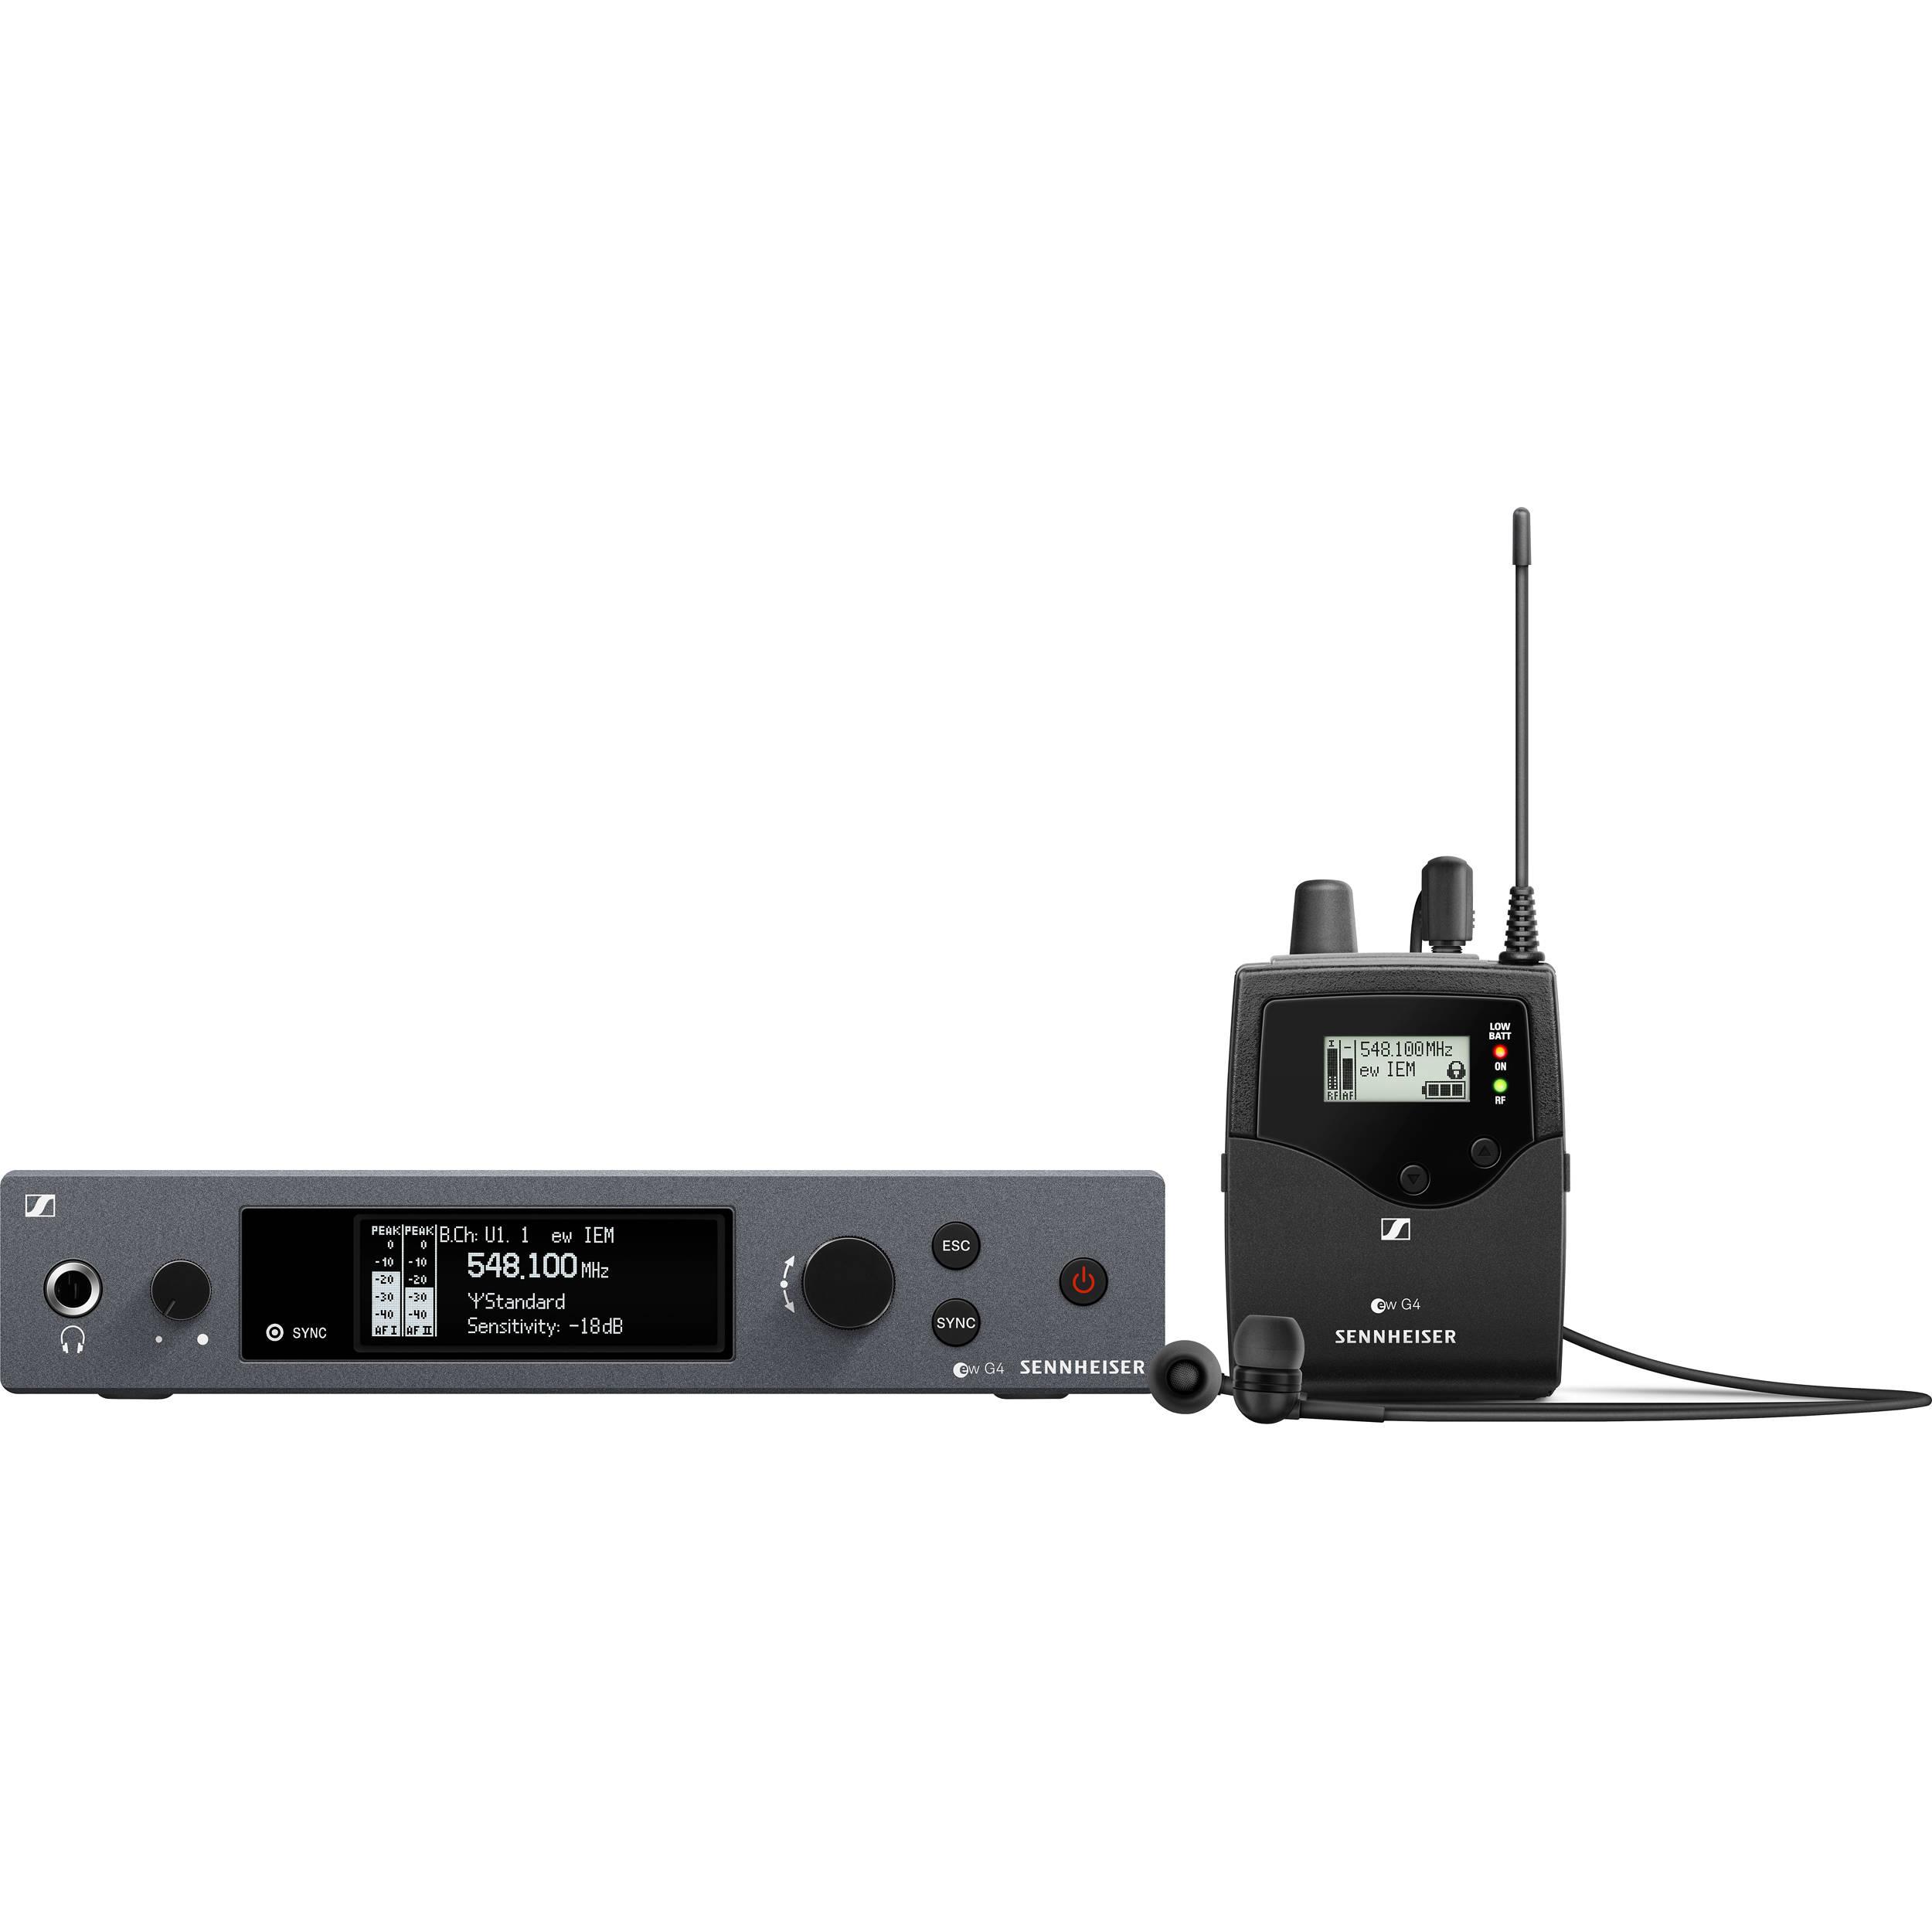 Sennheiser ew IEM G9 Wireless Monitor System (A: 9 to 9 MHz)